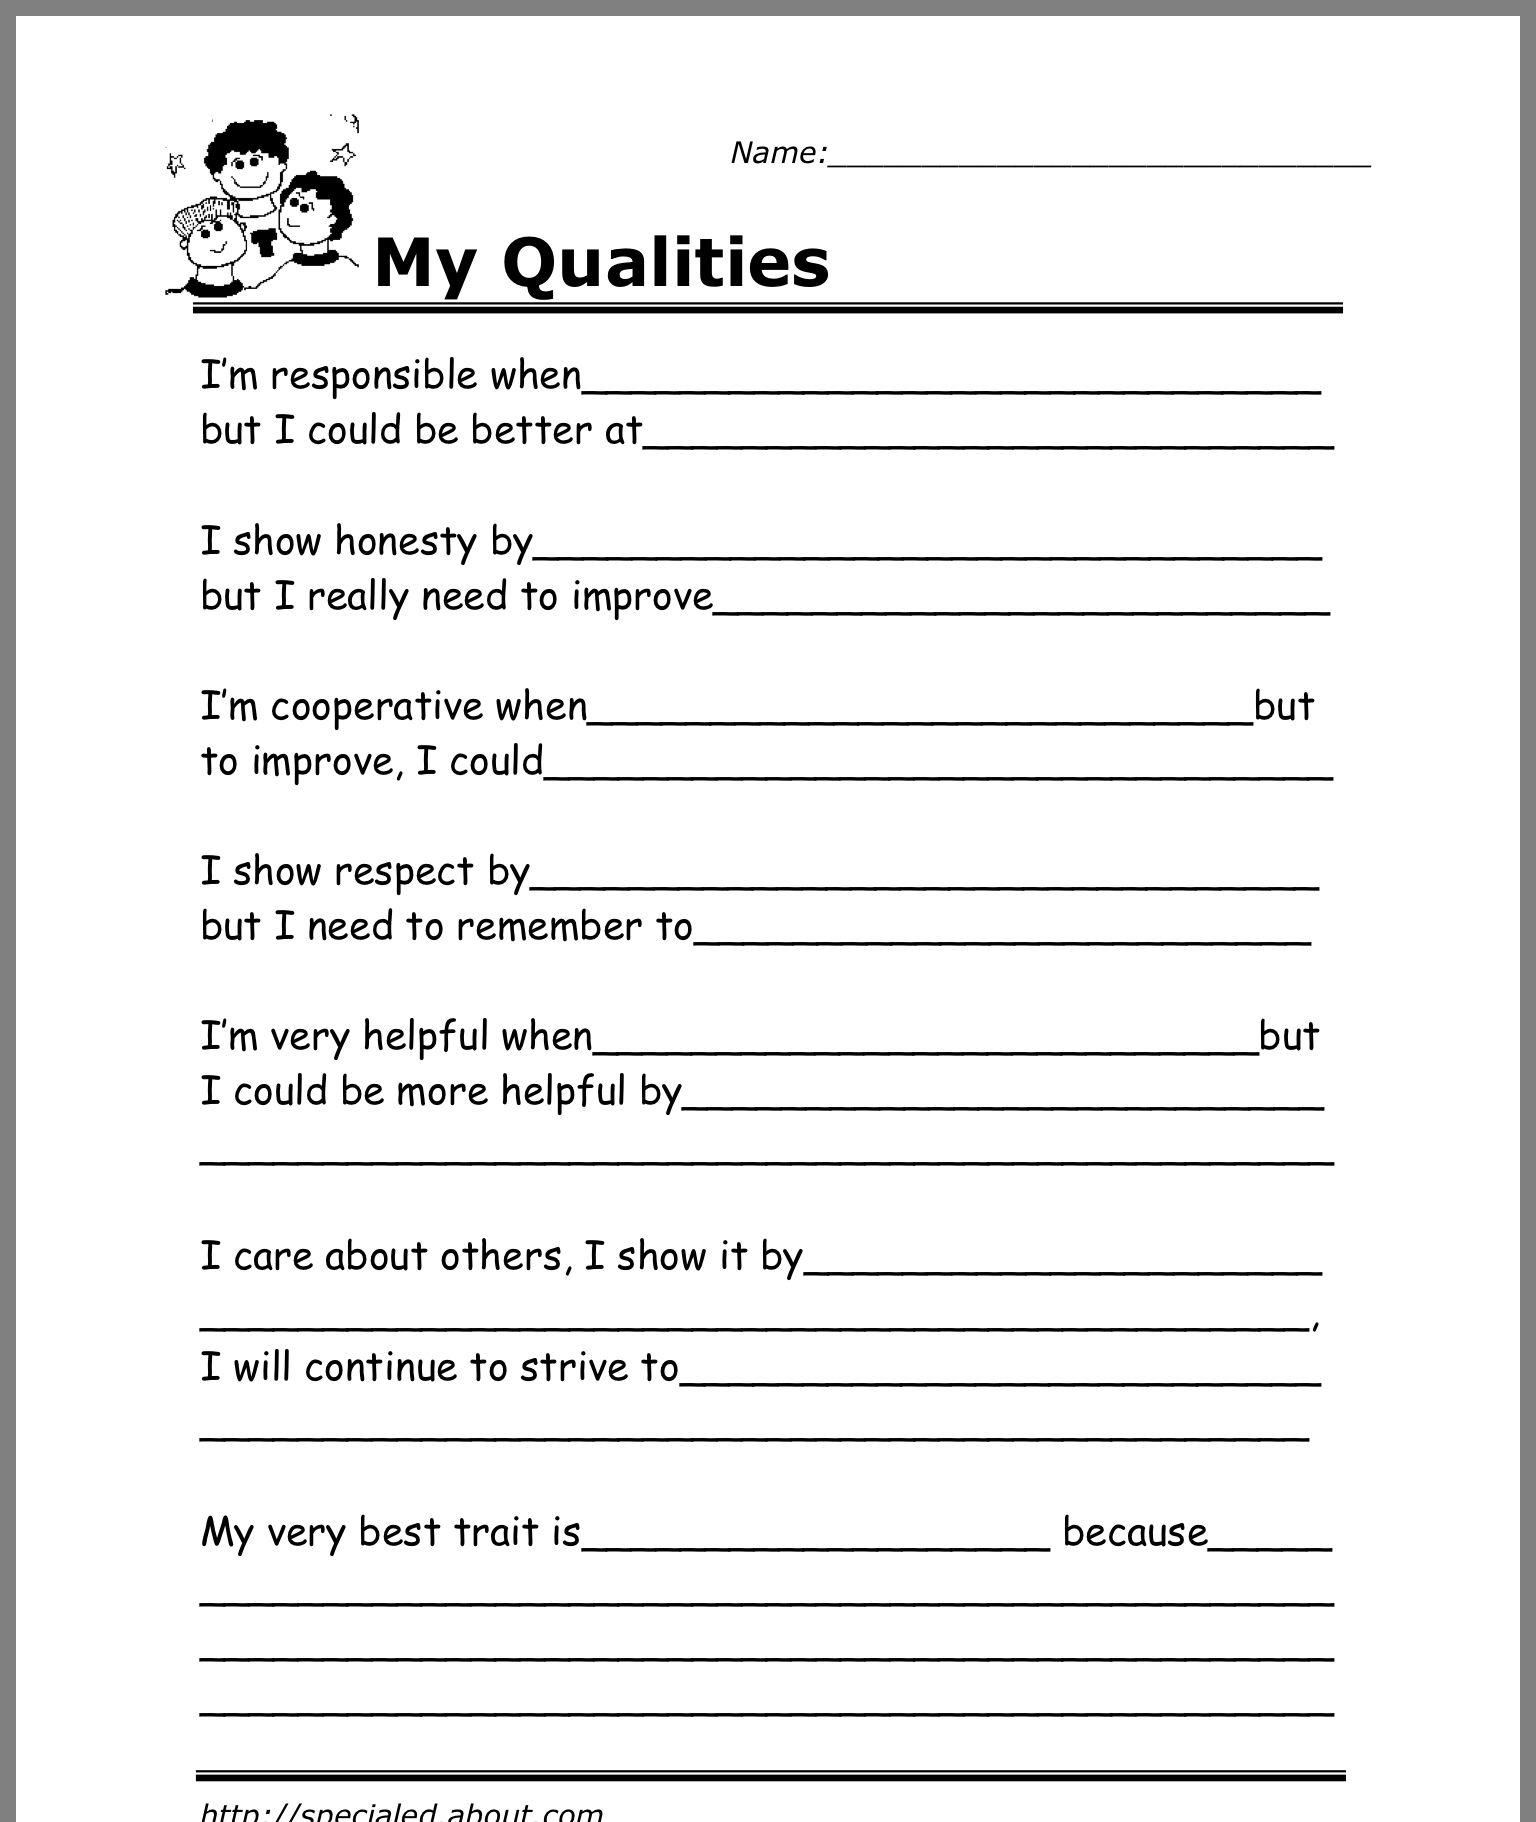 Pin By Winnie W On Counseling Self Esteem Worksheets Social Skills Activities Social Work Worksheets